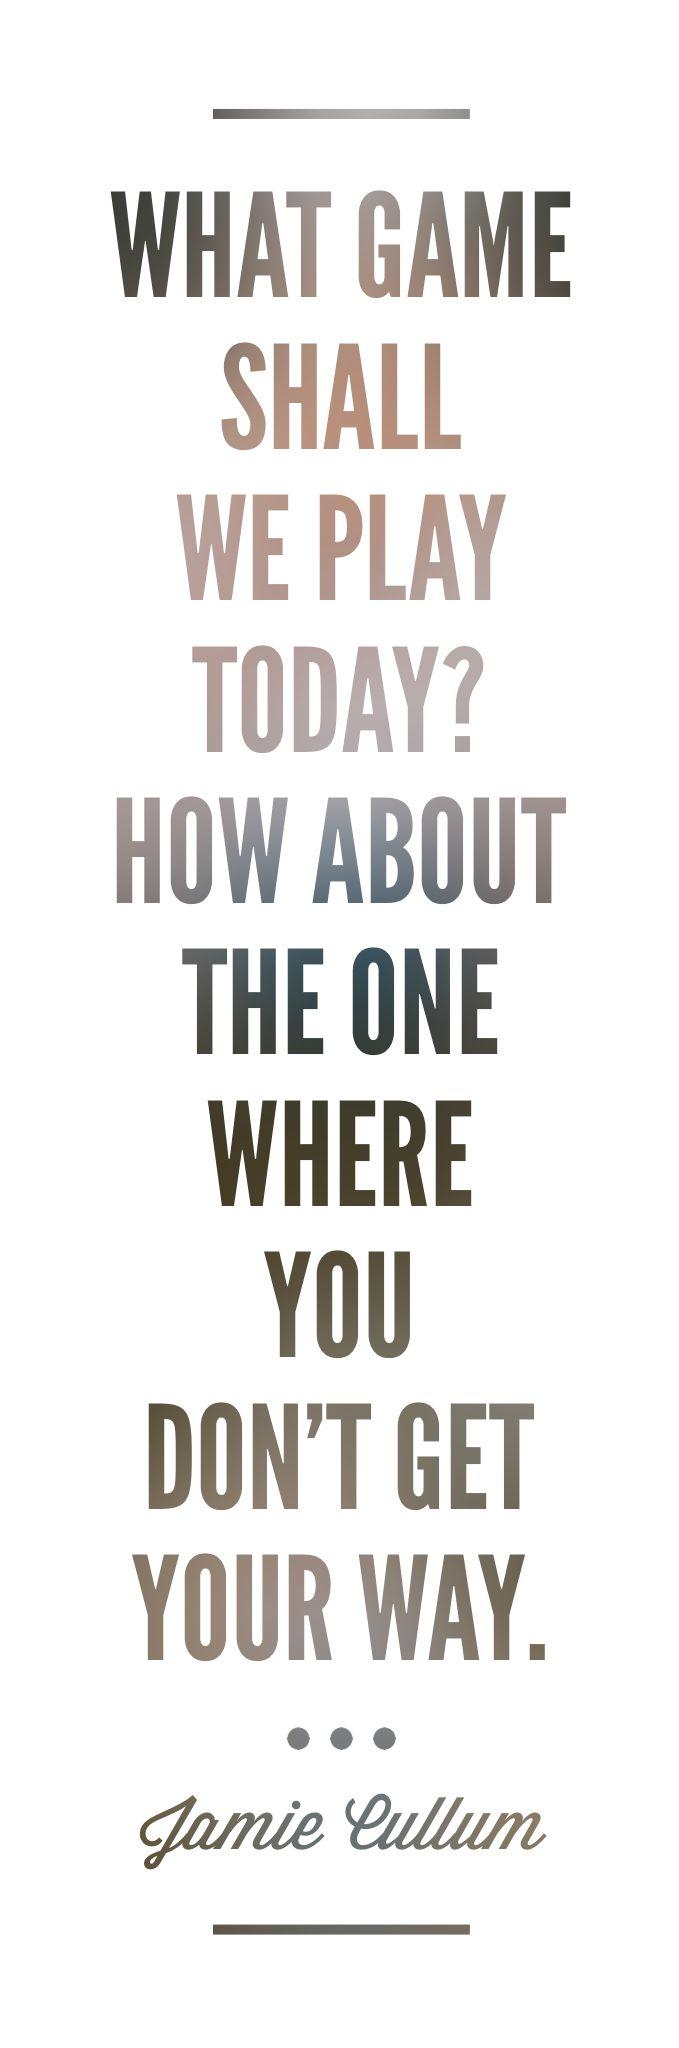 Get Your Way. Jamie Cullum. #lyrics